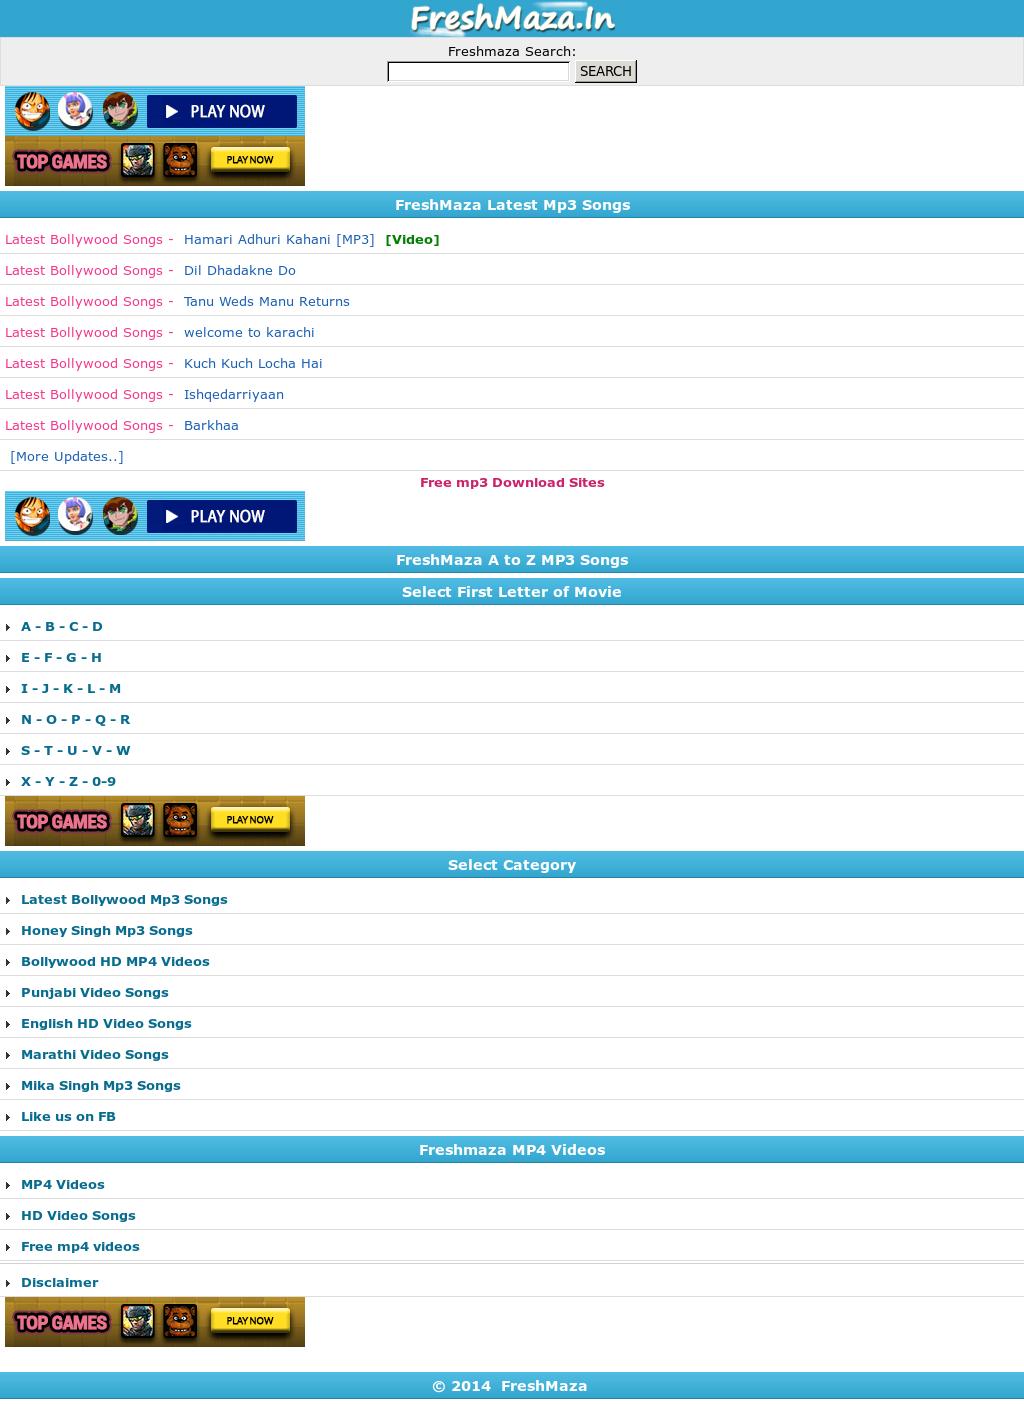 freshmaza video songs mp4 bollywood free download hd